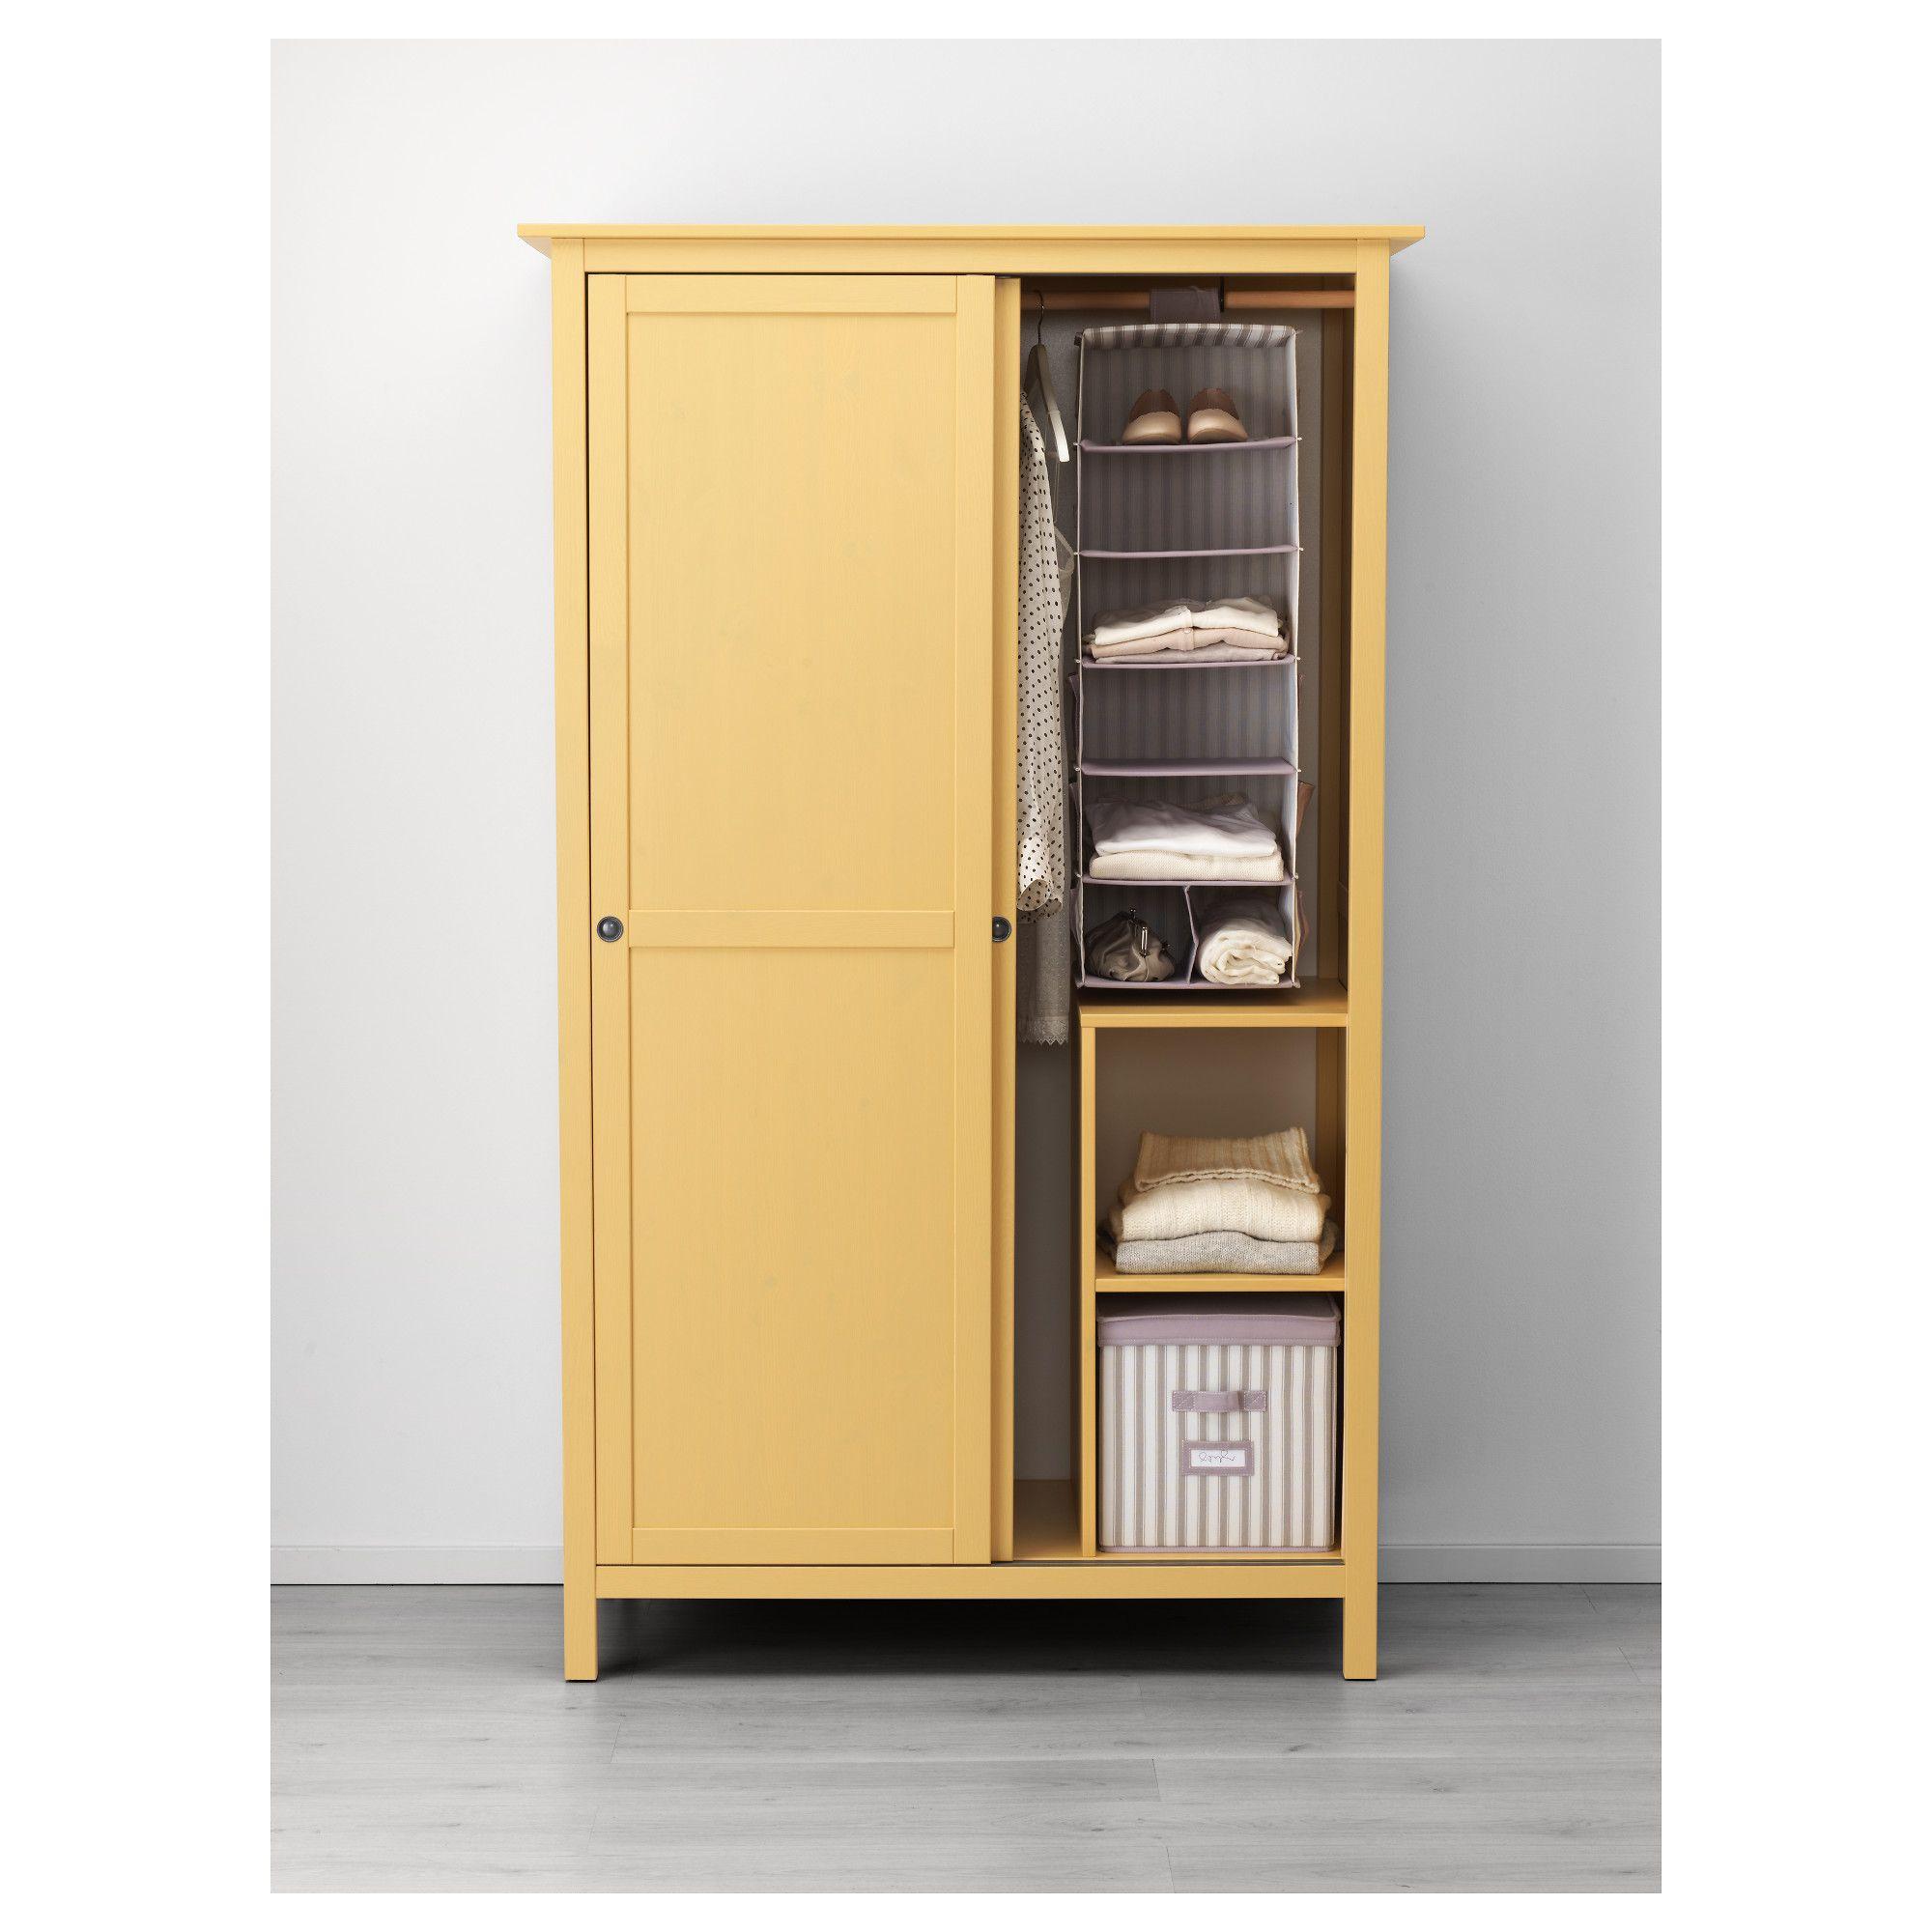 Furniture And Home Furnishings Hemnes Wardrobe Modern Closet